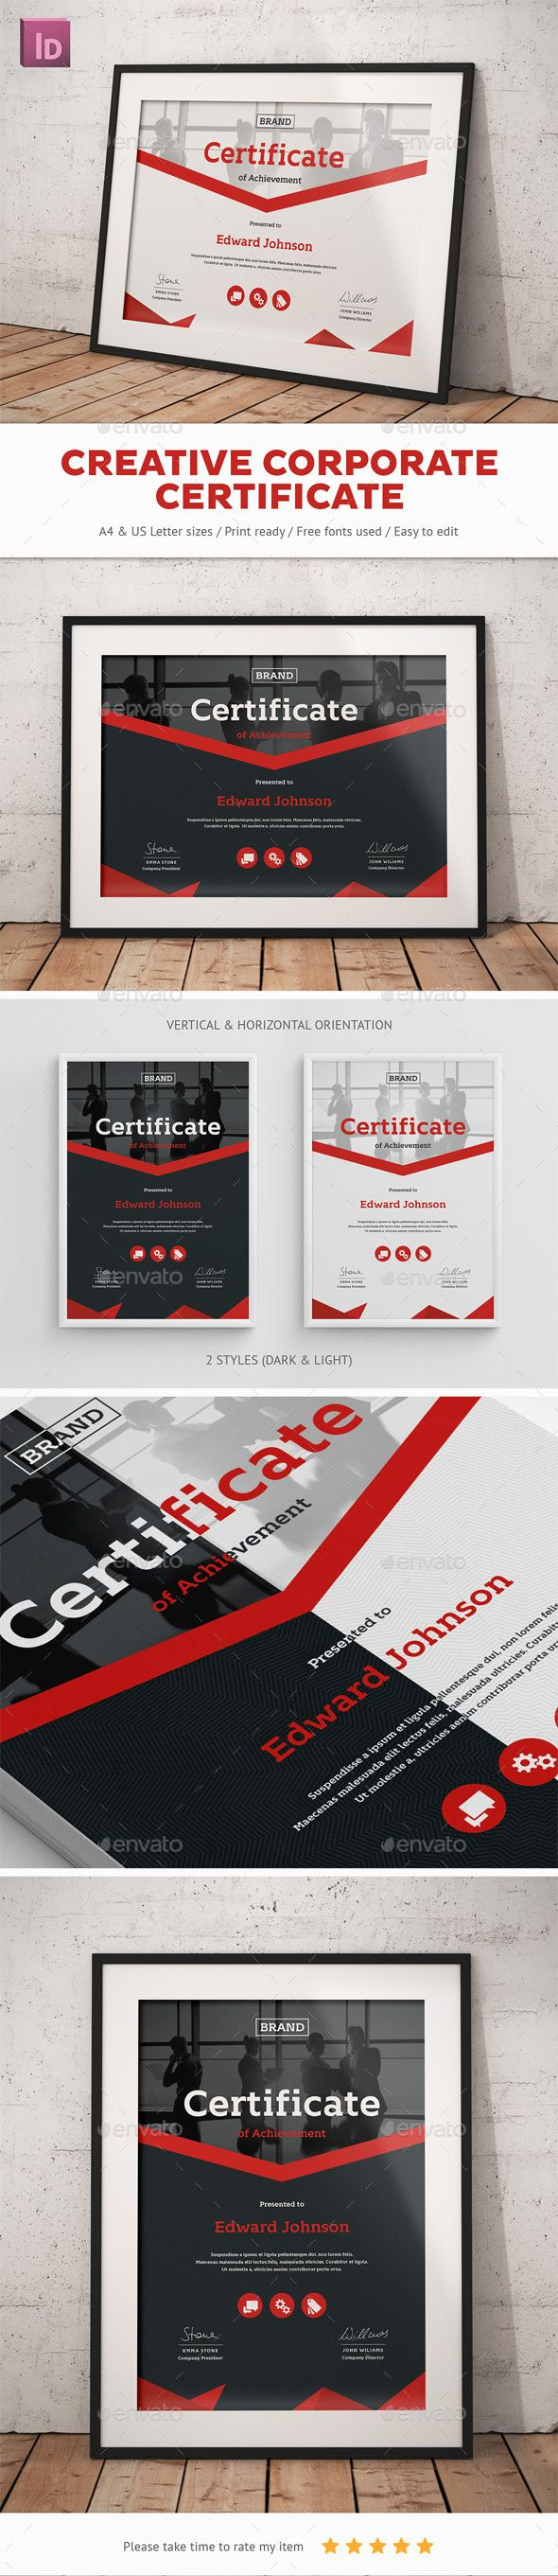 Creative Corporate Certificate - Certificates Stationery                                                                                                                                                                                 More